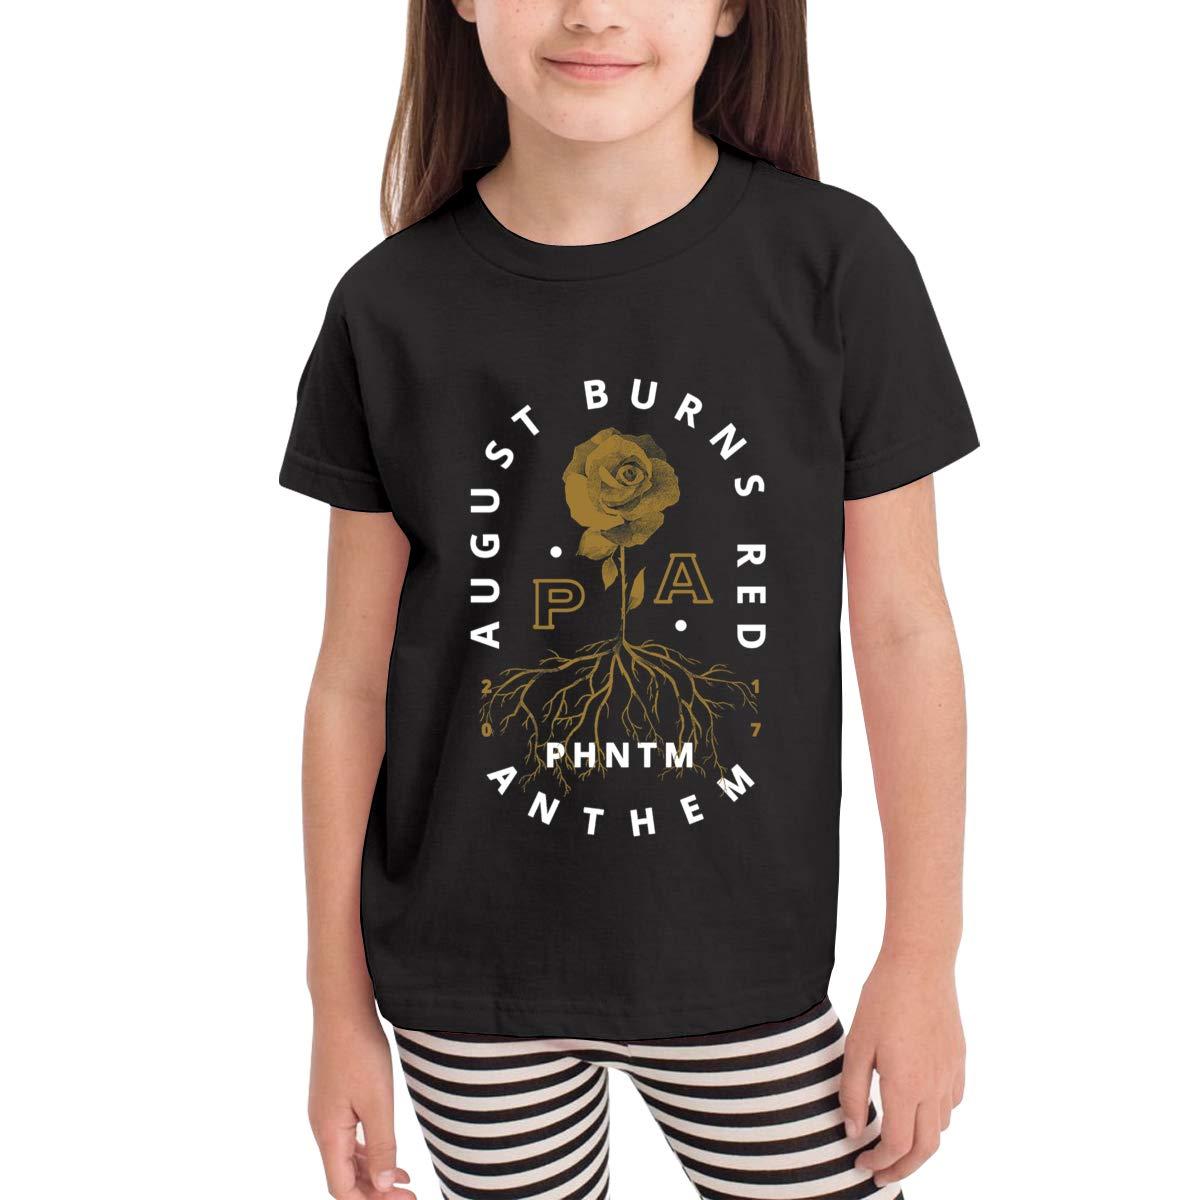 HipsterShirt Black Kangtians Hannah Baby AUGUSTBURNS-Flower